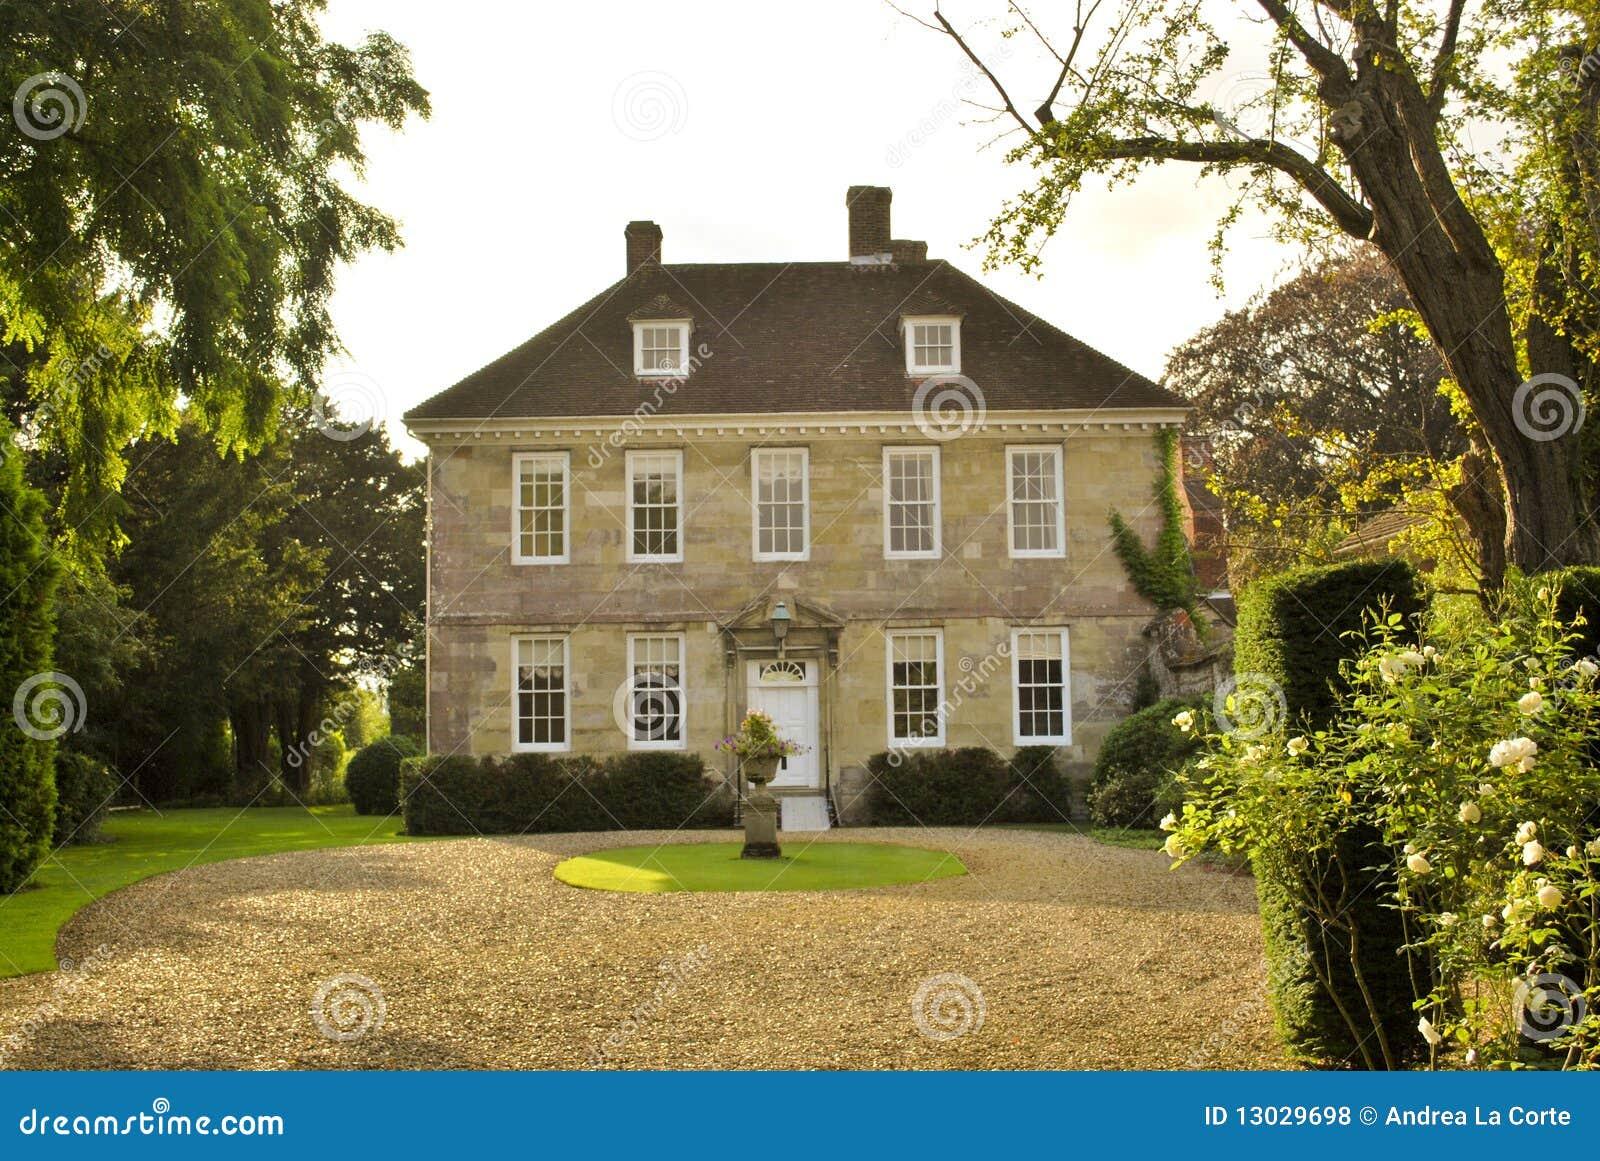 Casa di campagna inglese fotografia stock immagine di for Design di casa di campagna inglese